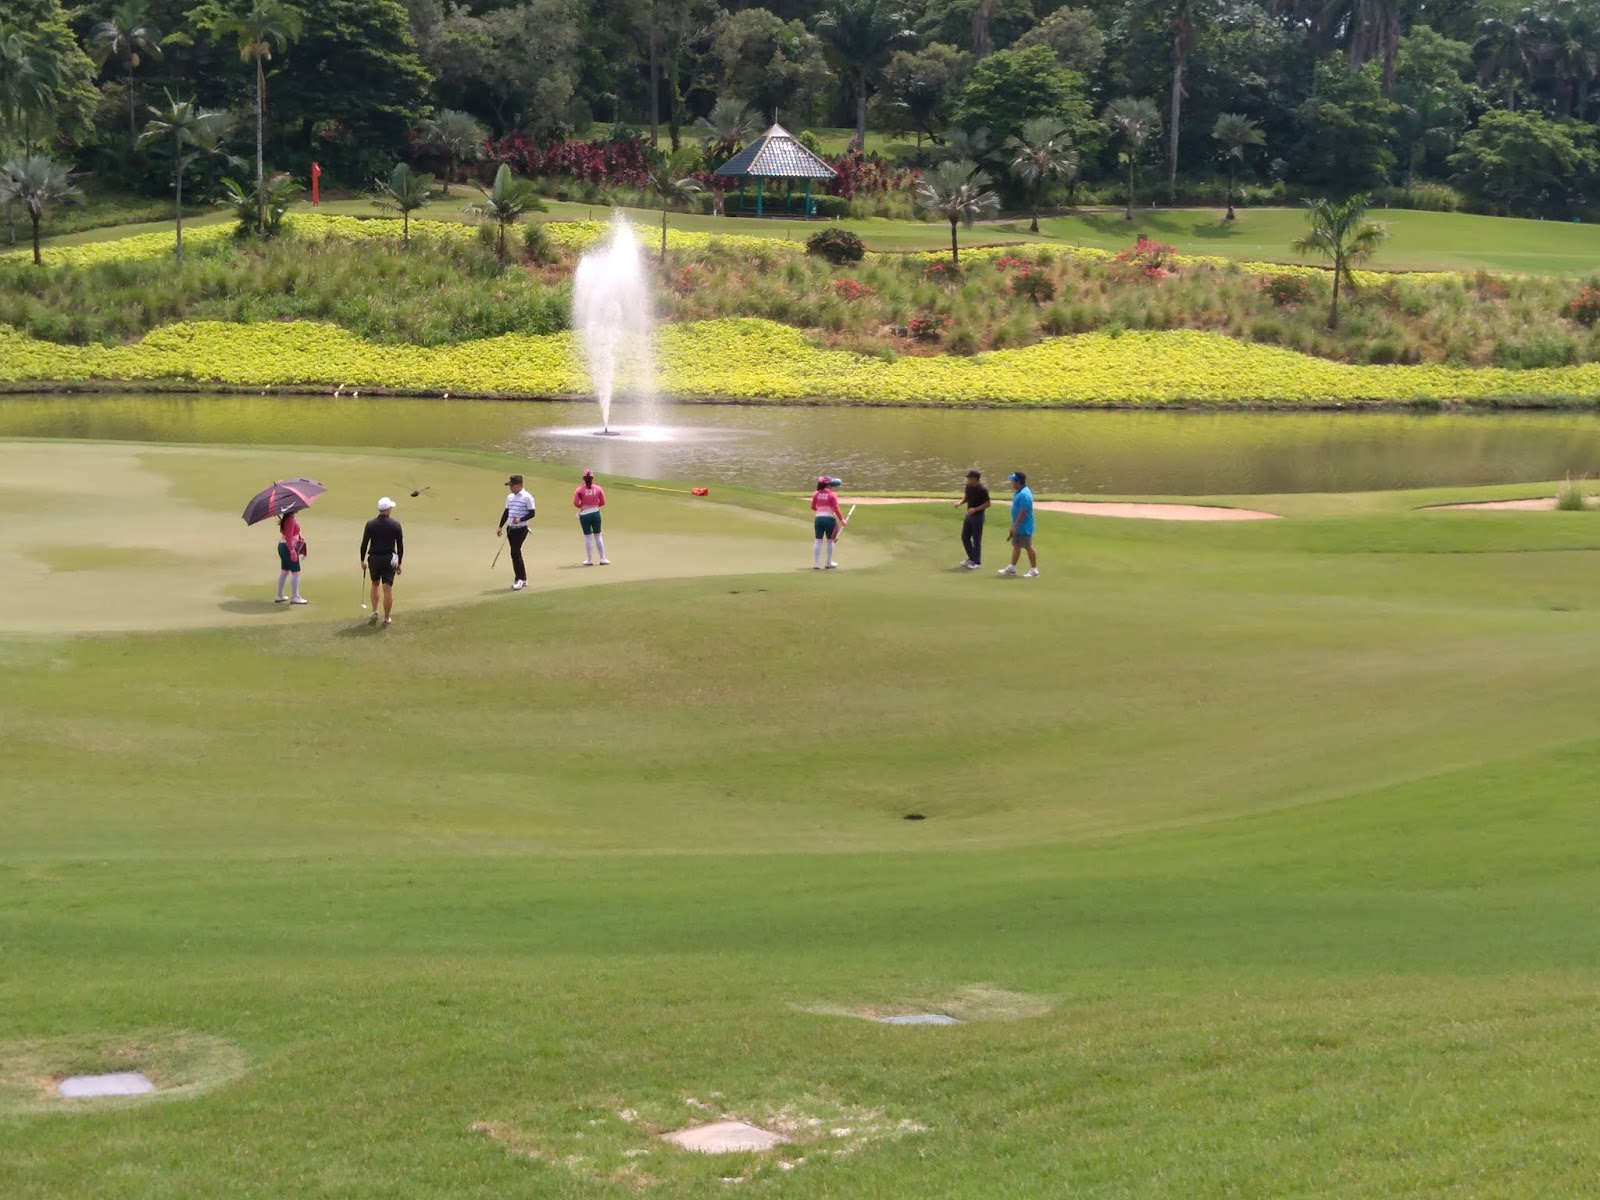 Golf Seru, Golf Asyik, Kompetisi Golf